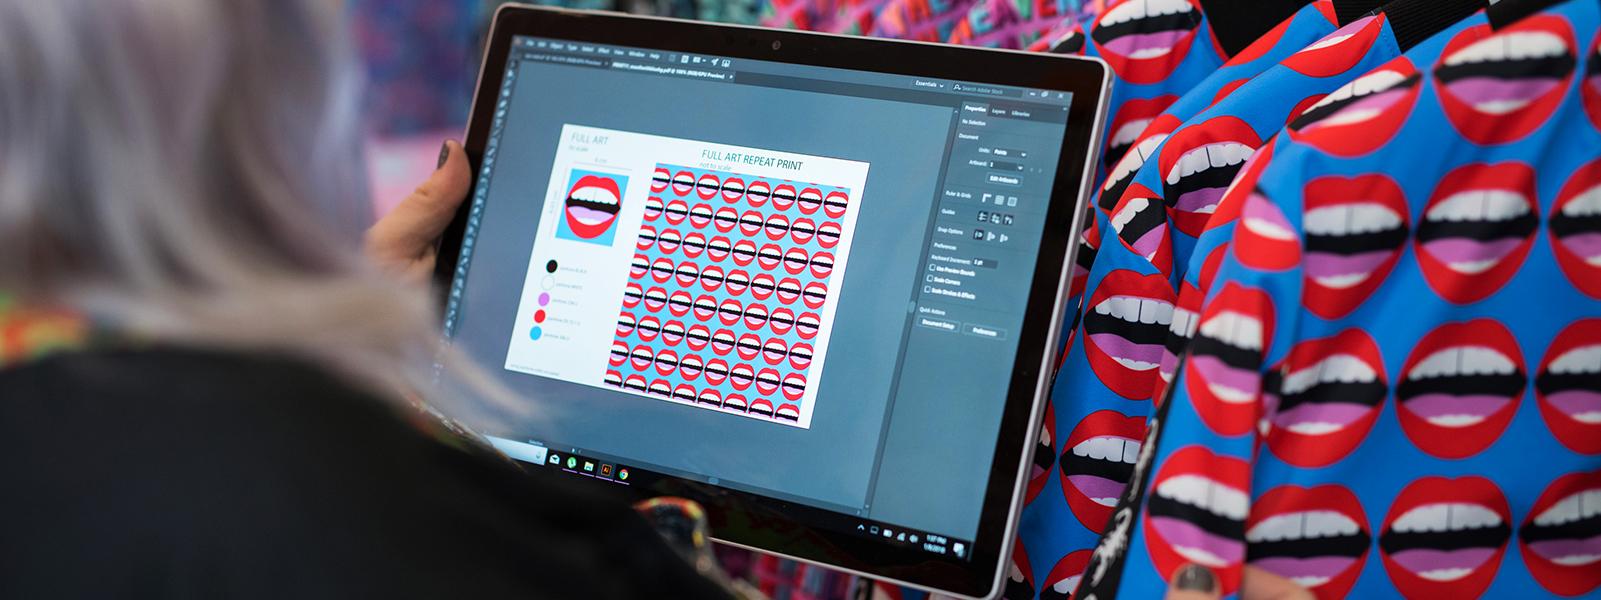 Surface Book portability